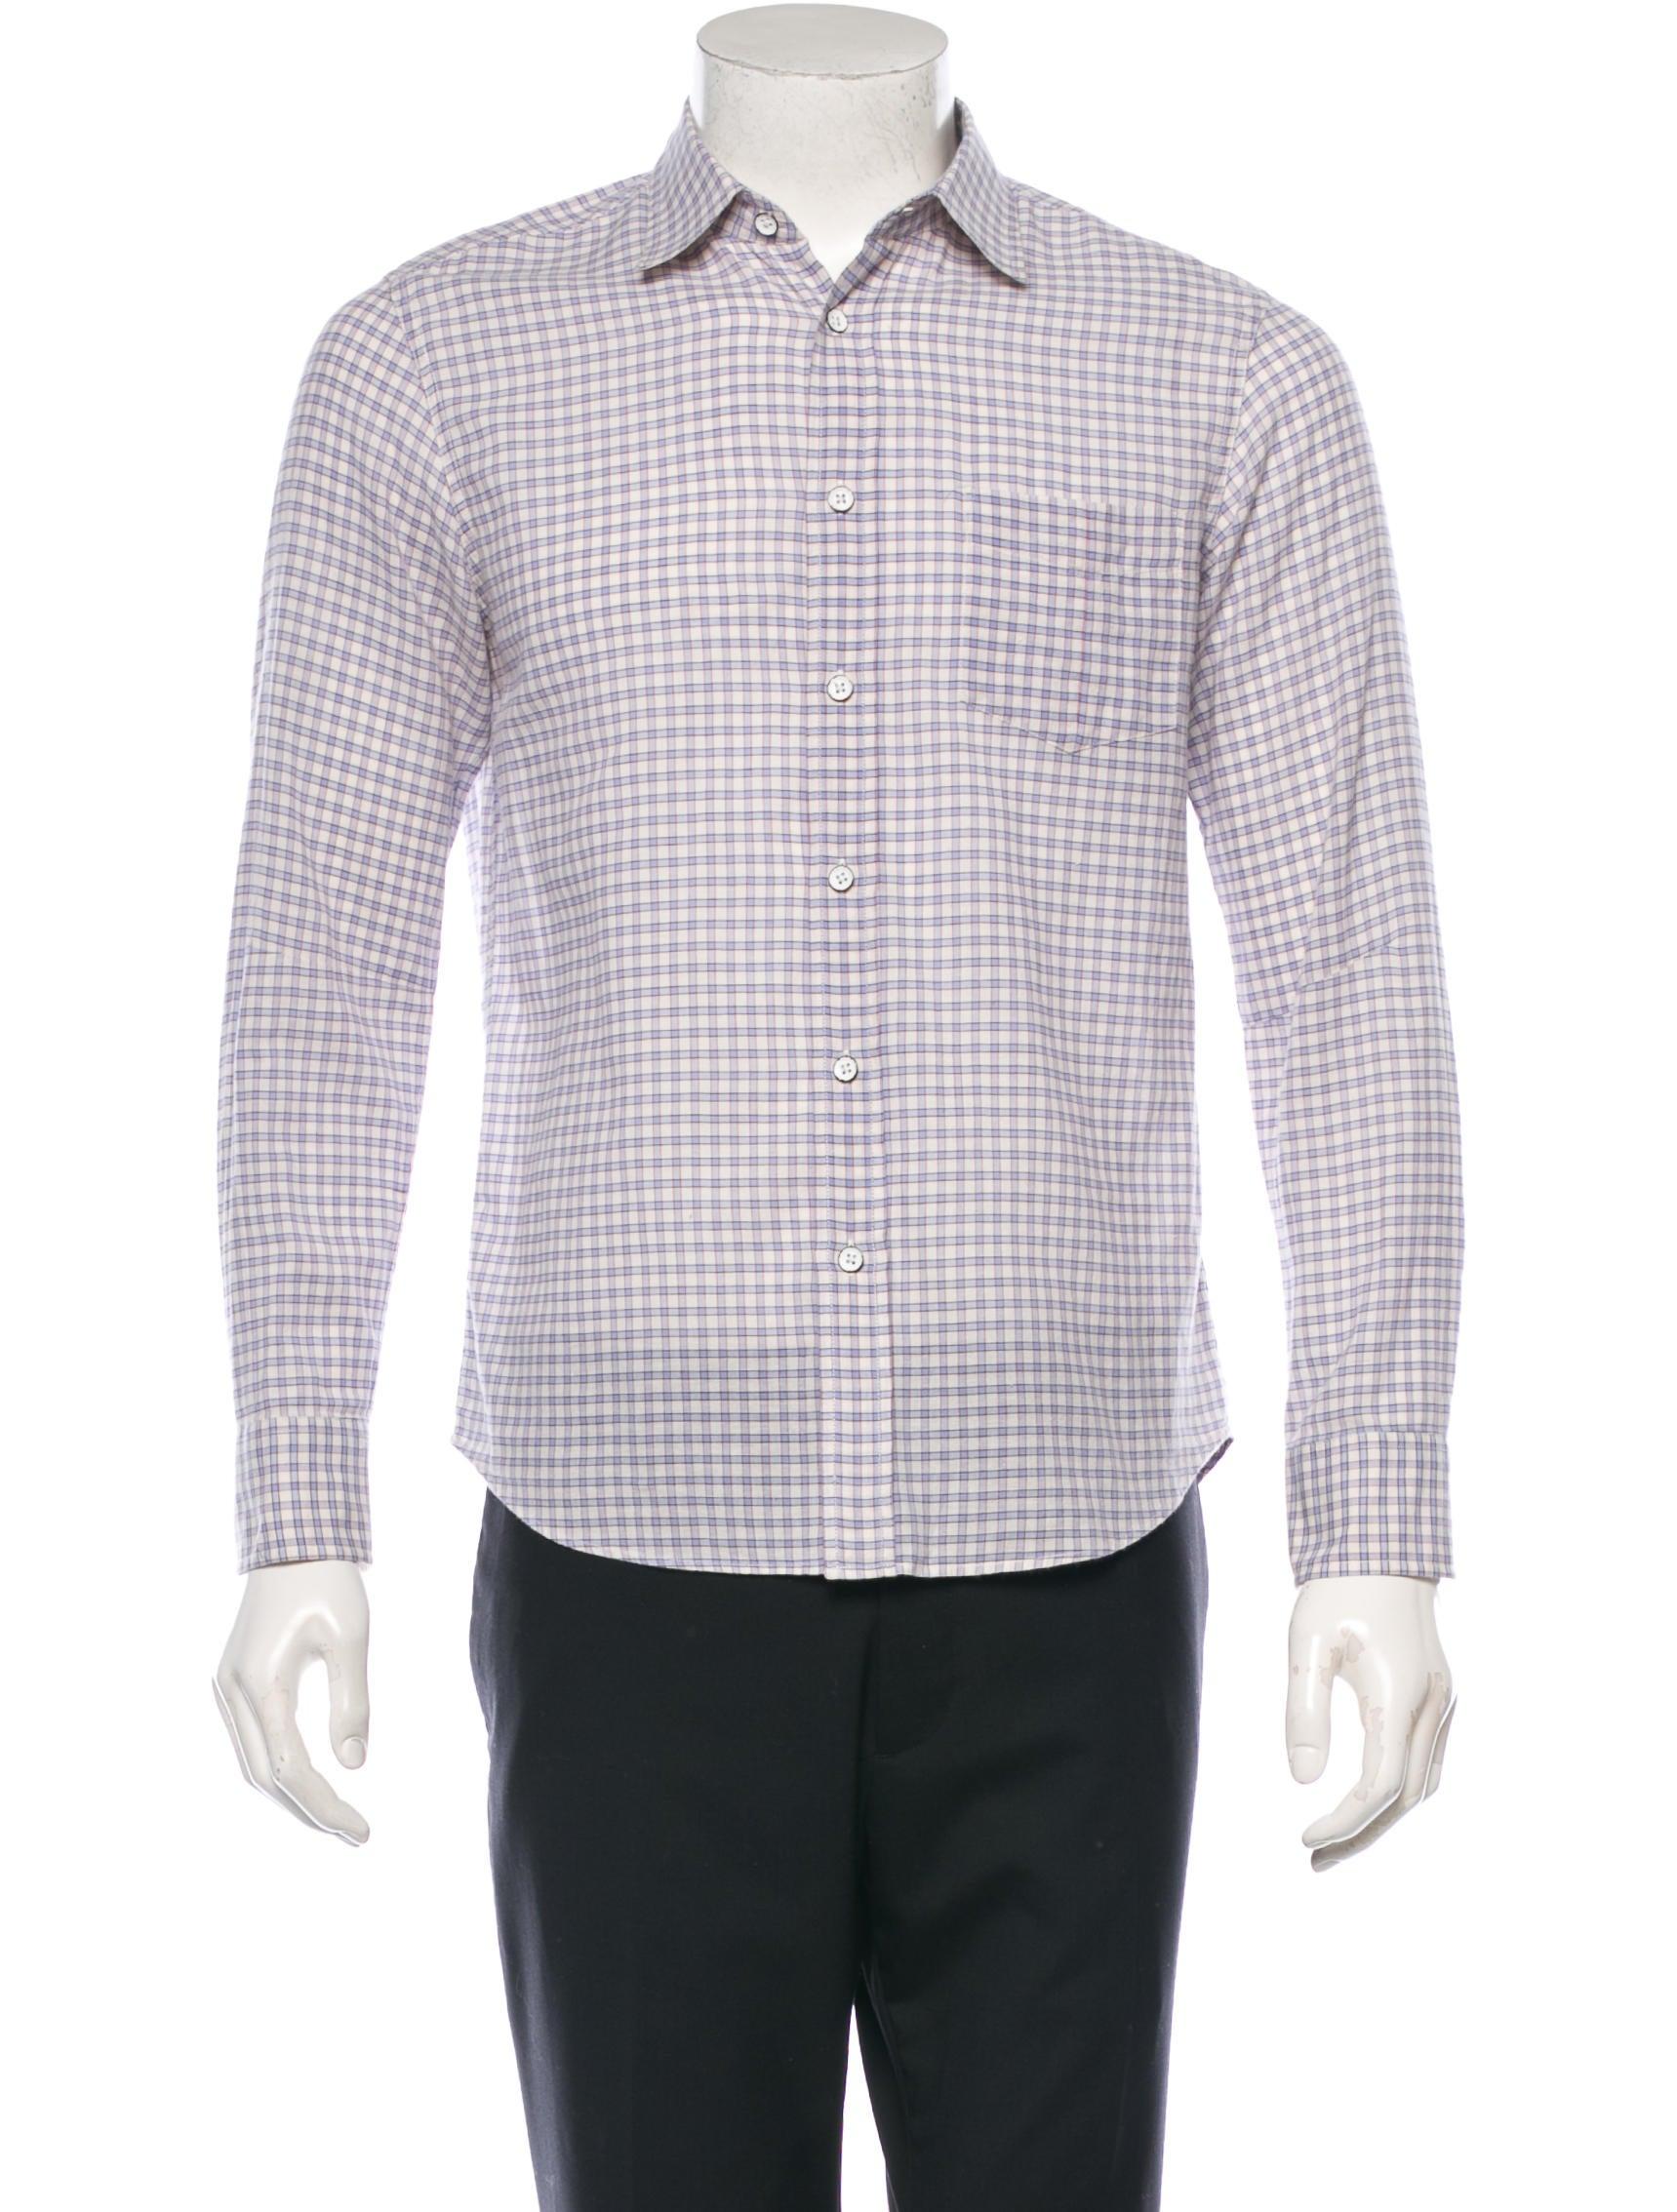 Rag Bone Long Sleeve Button Up Shirt Clothing